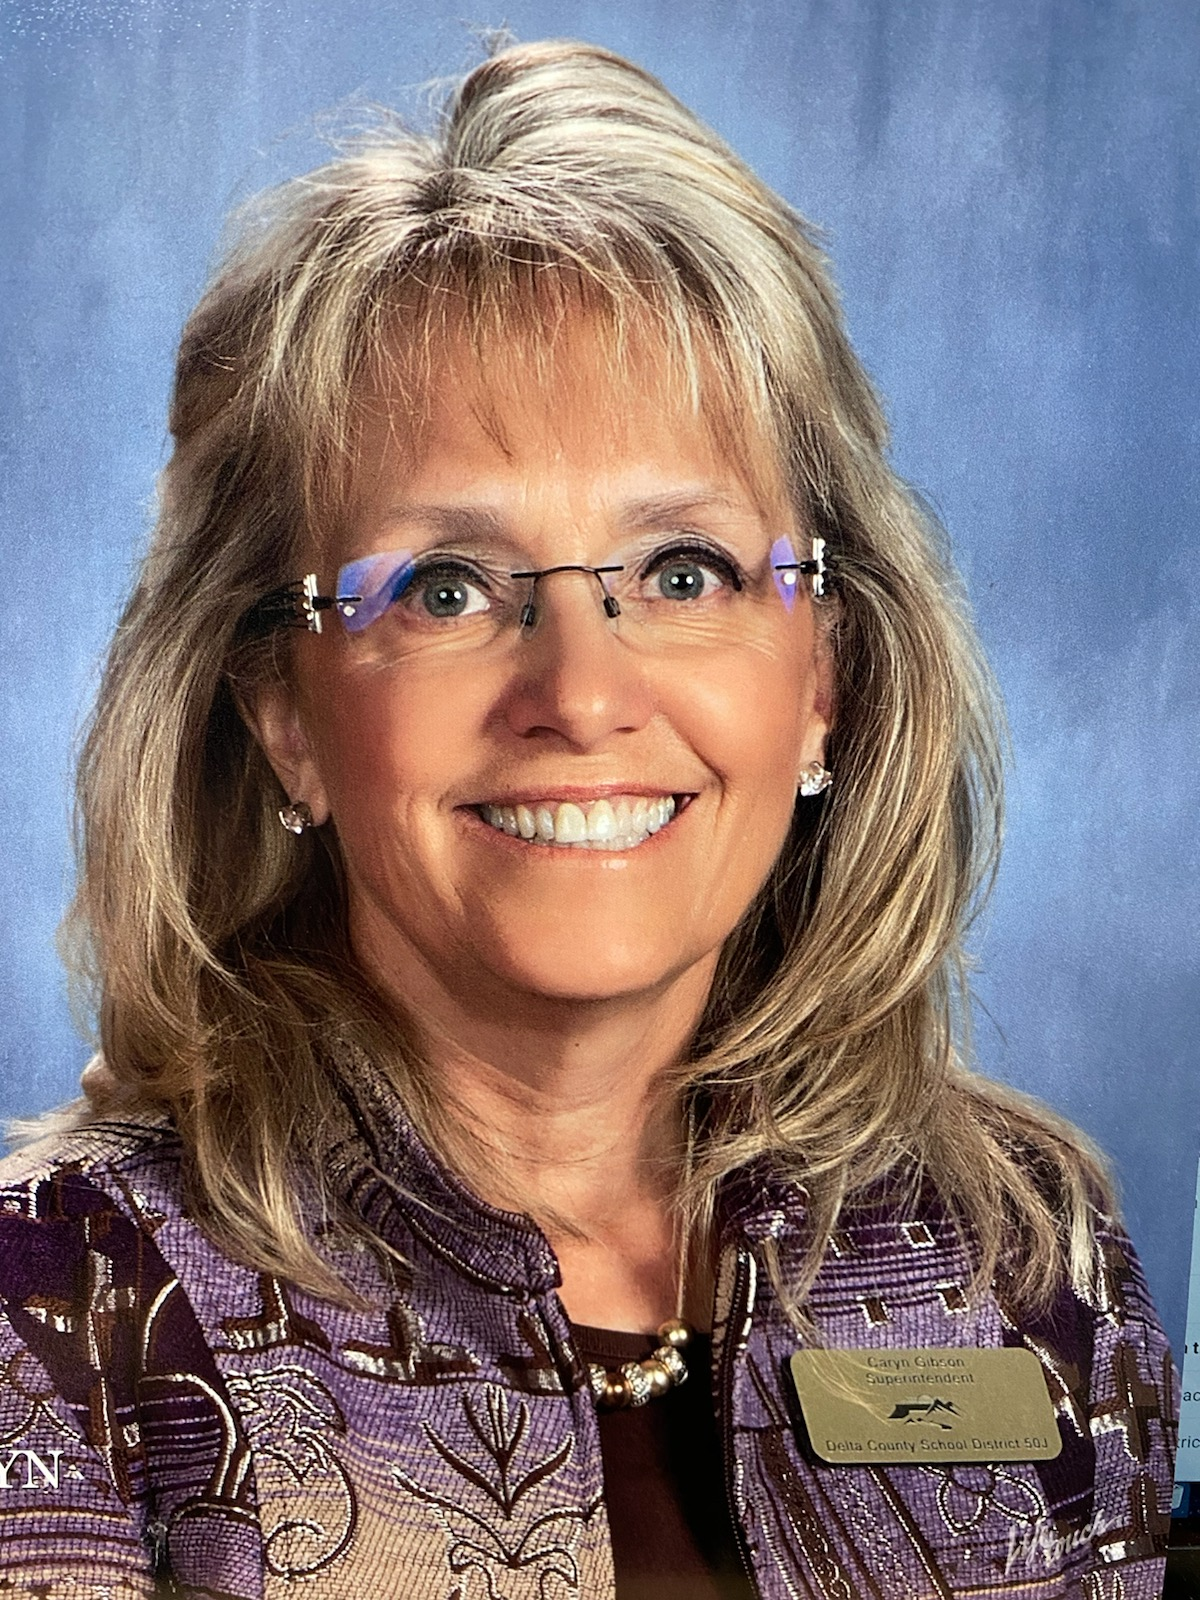 Superintendent Caryn Gibson